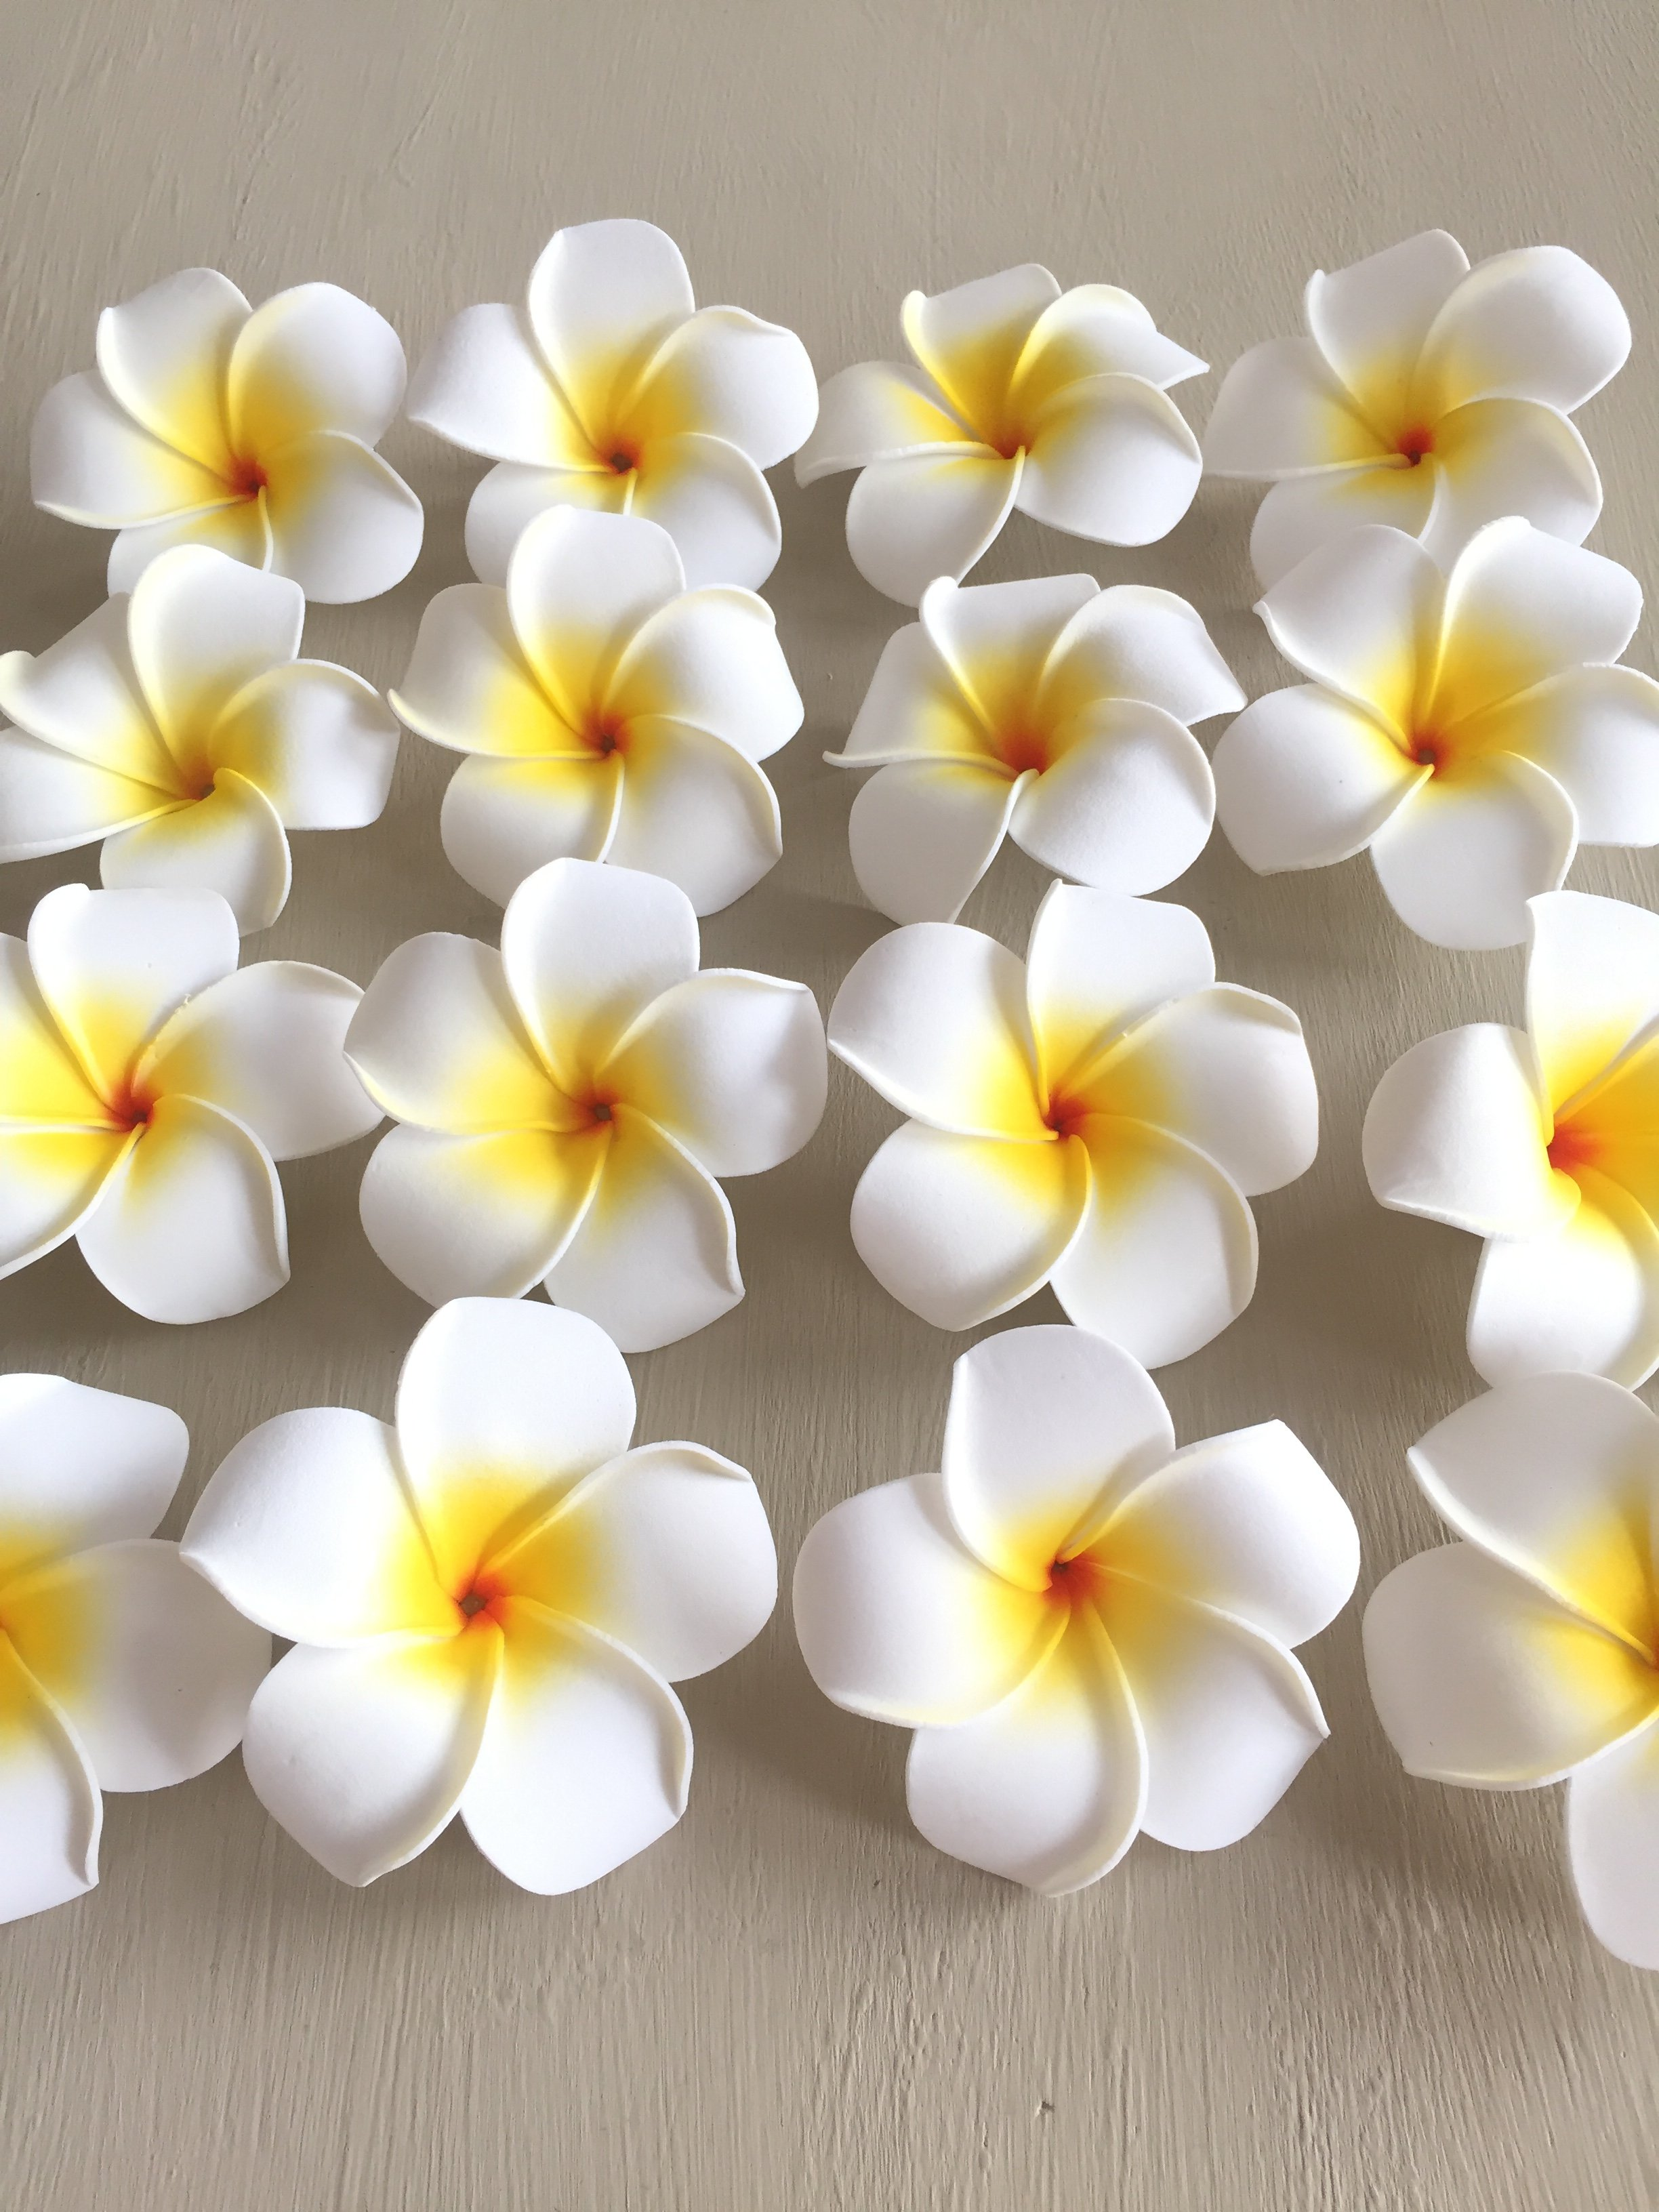 Frangipani Plumeria Flower Hair Clip Flores De Papel Modelos De Flor De Papel Origami Tutorial